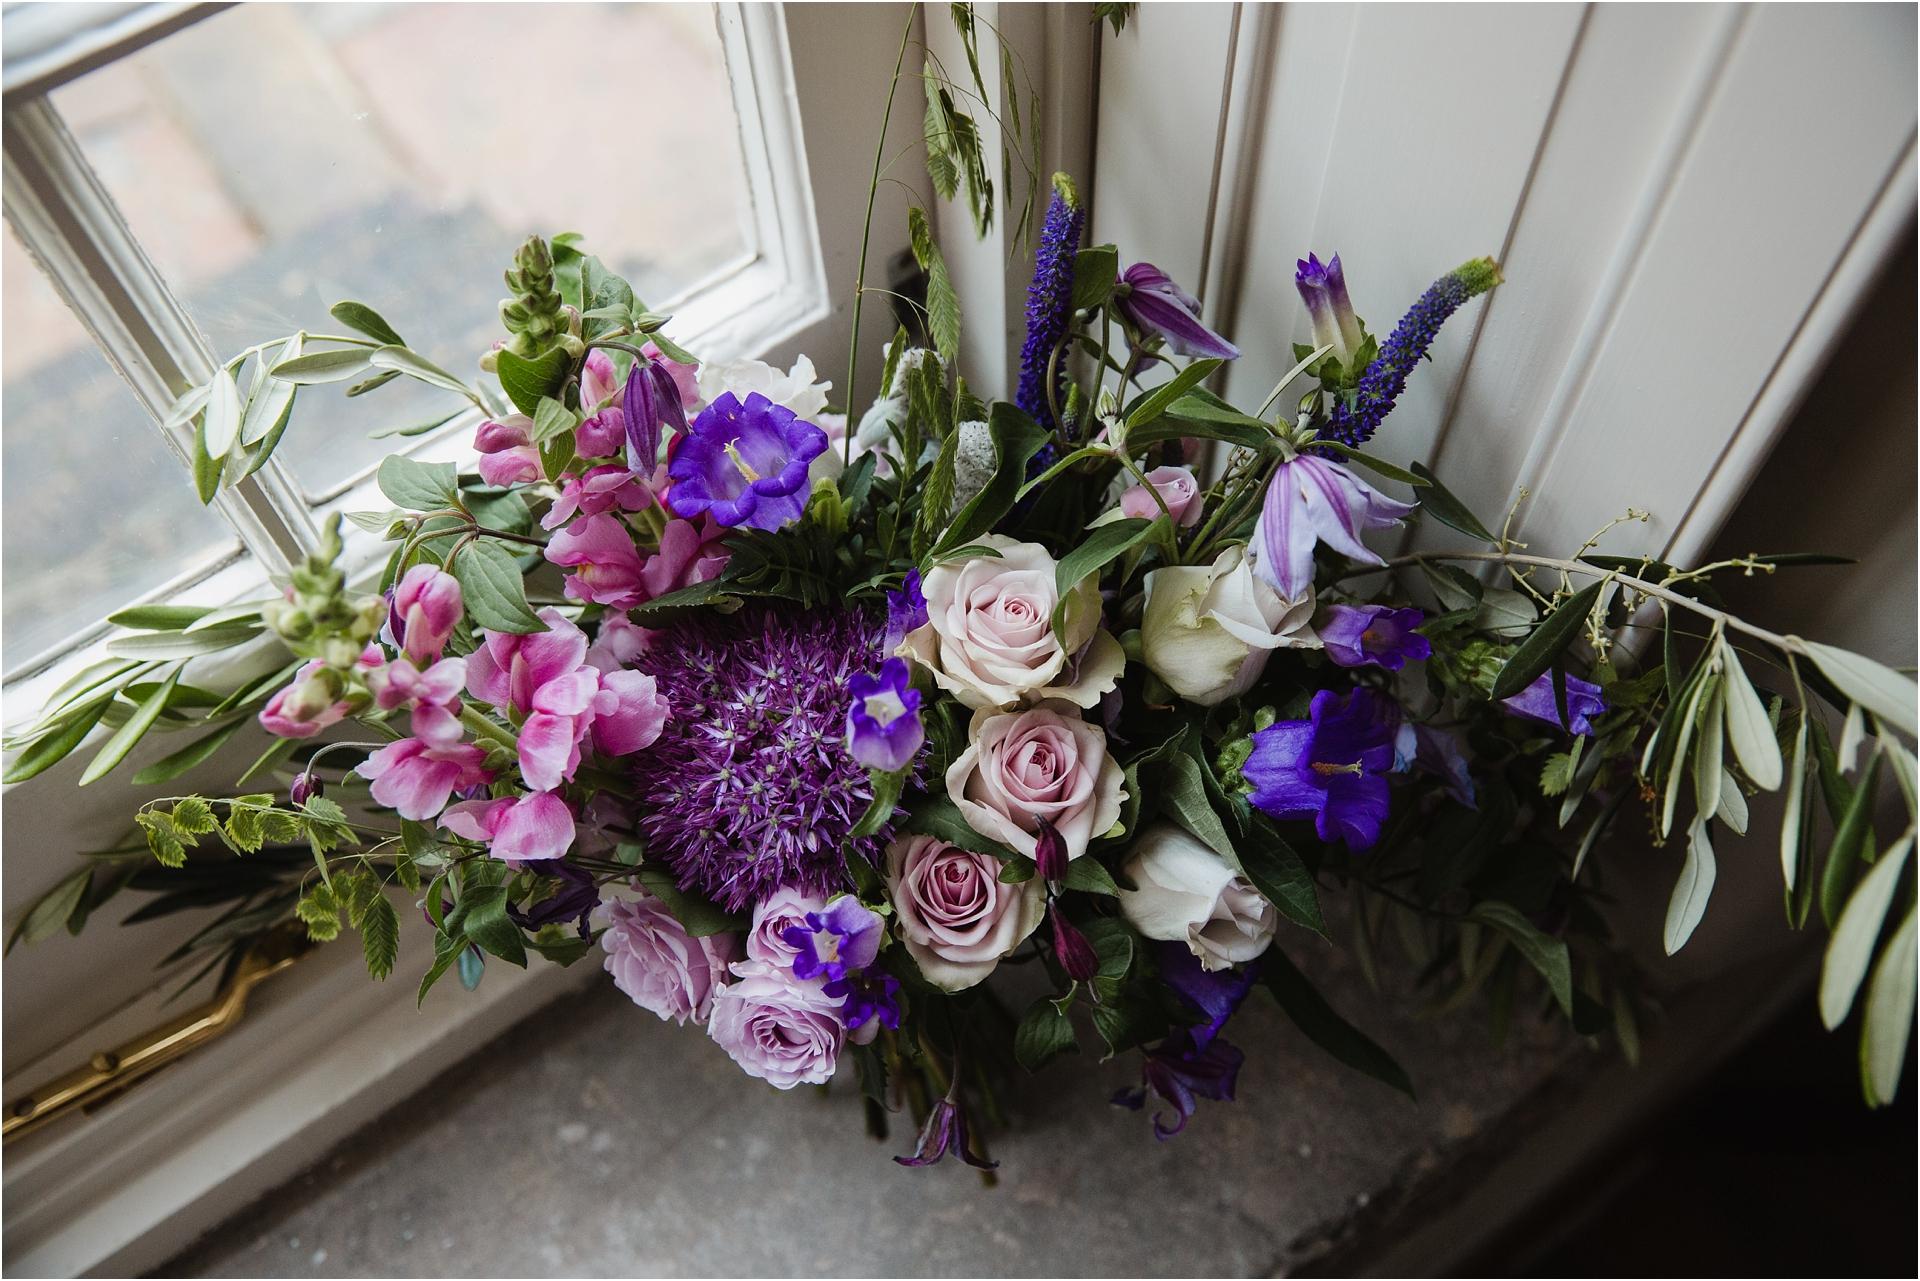 Cambells flowers